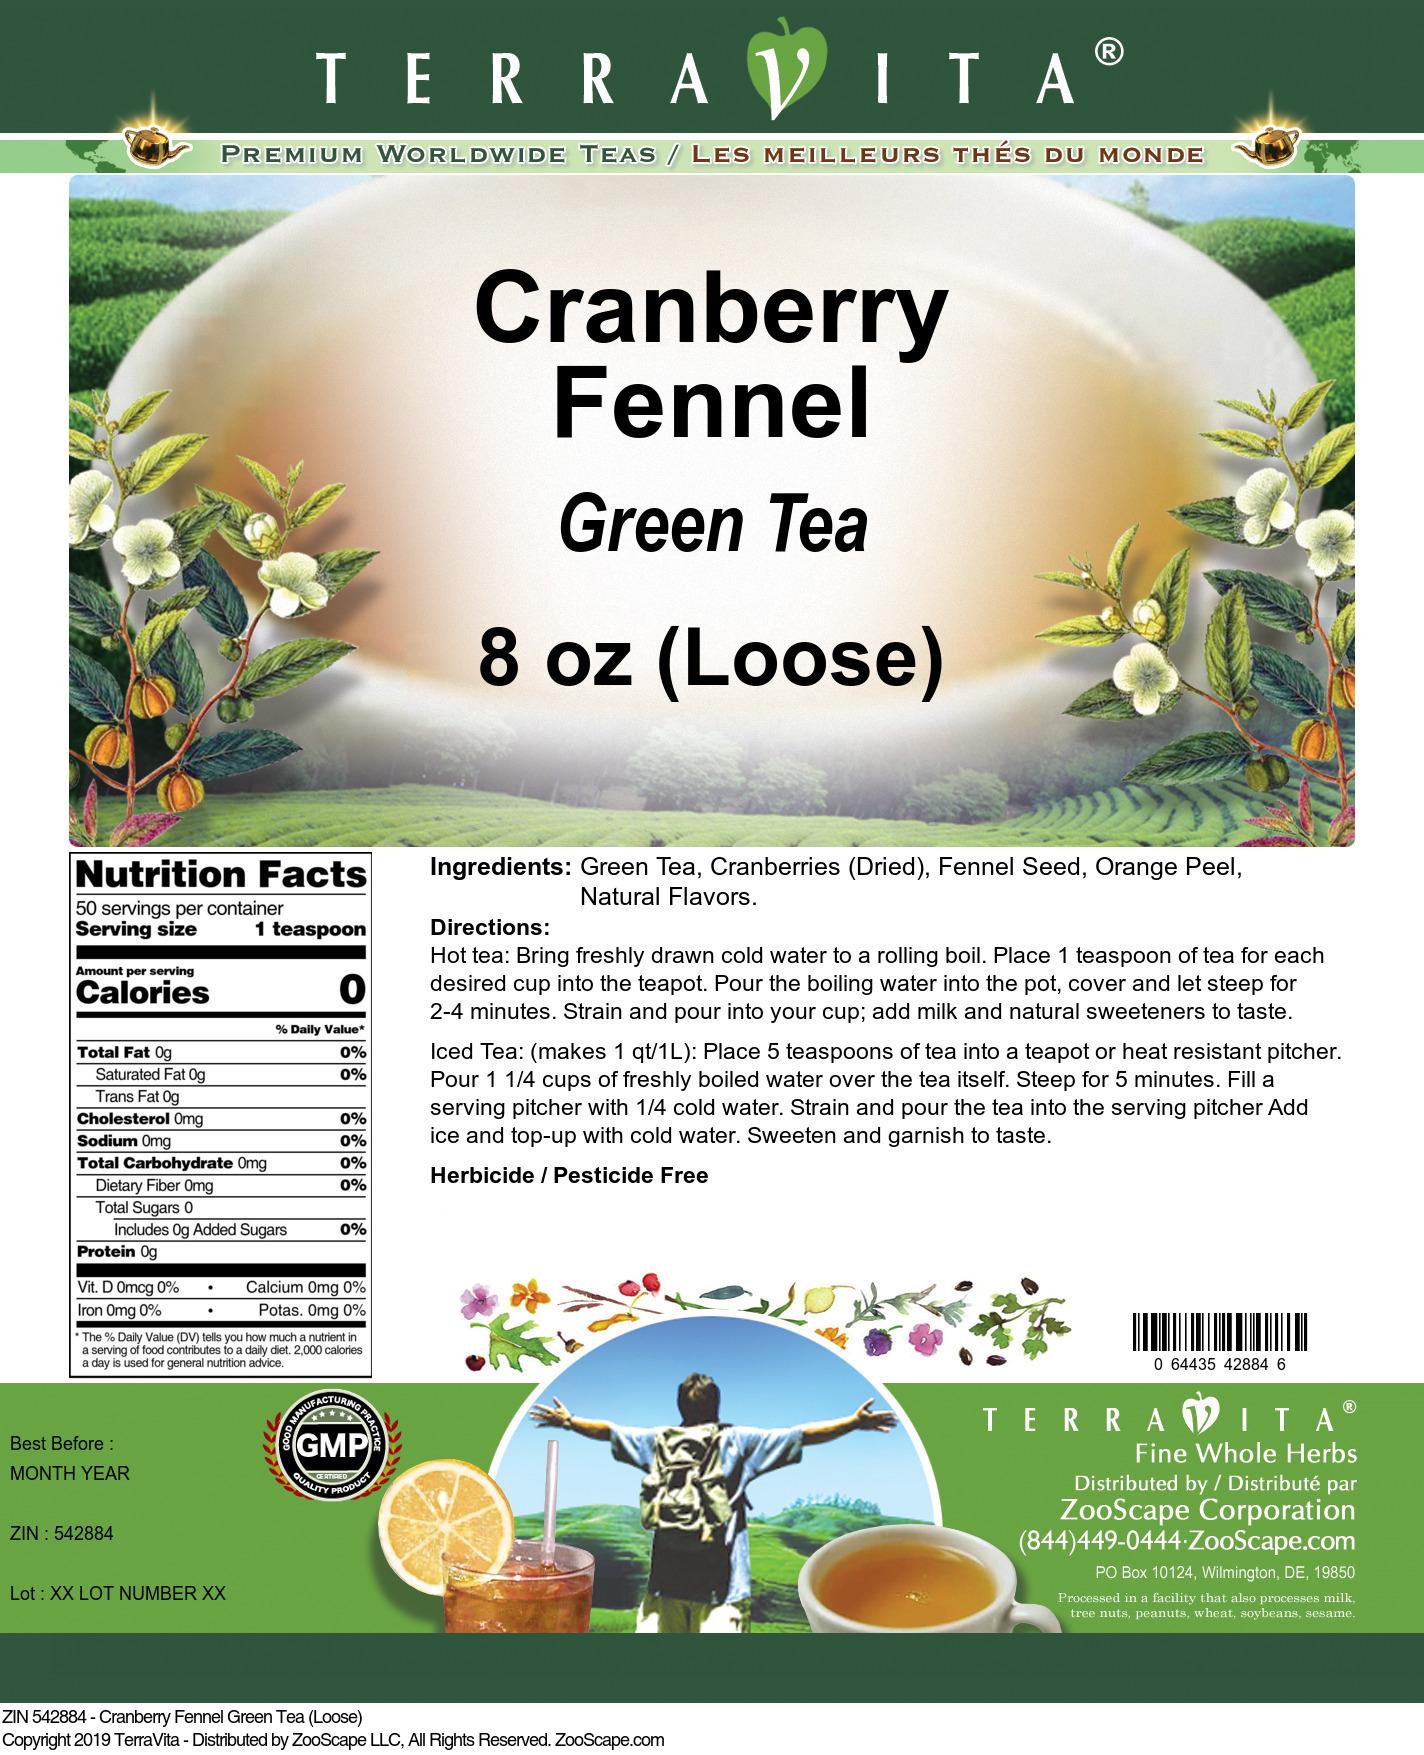 Cranberry Fennel Green Tea